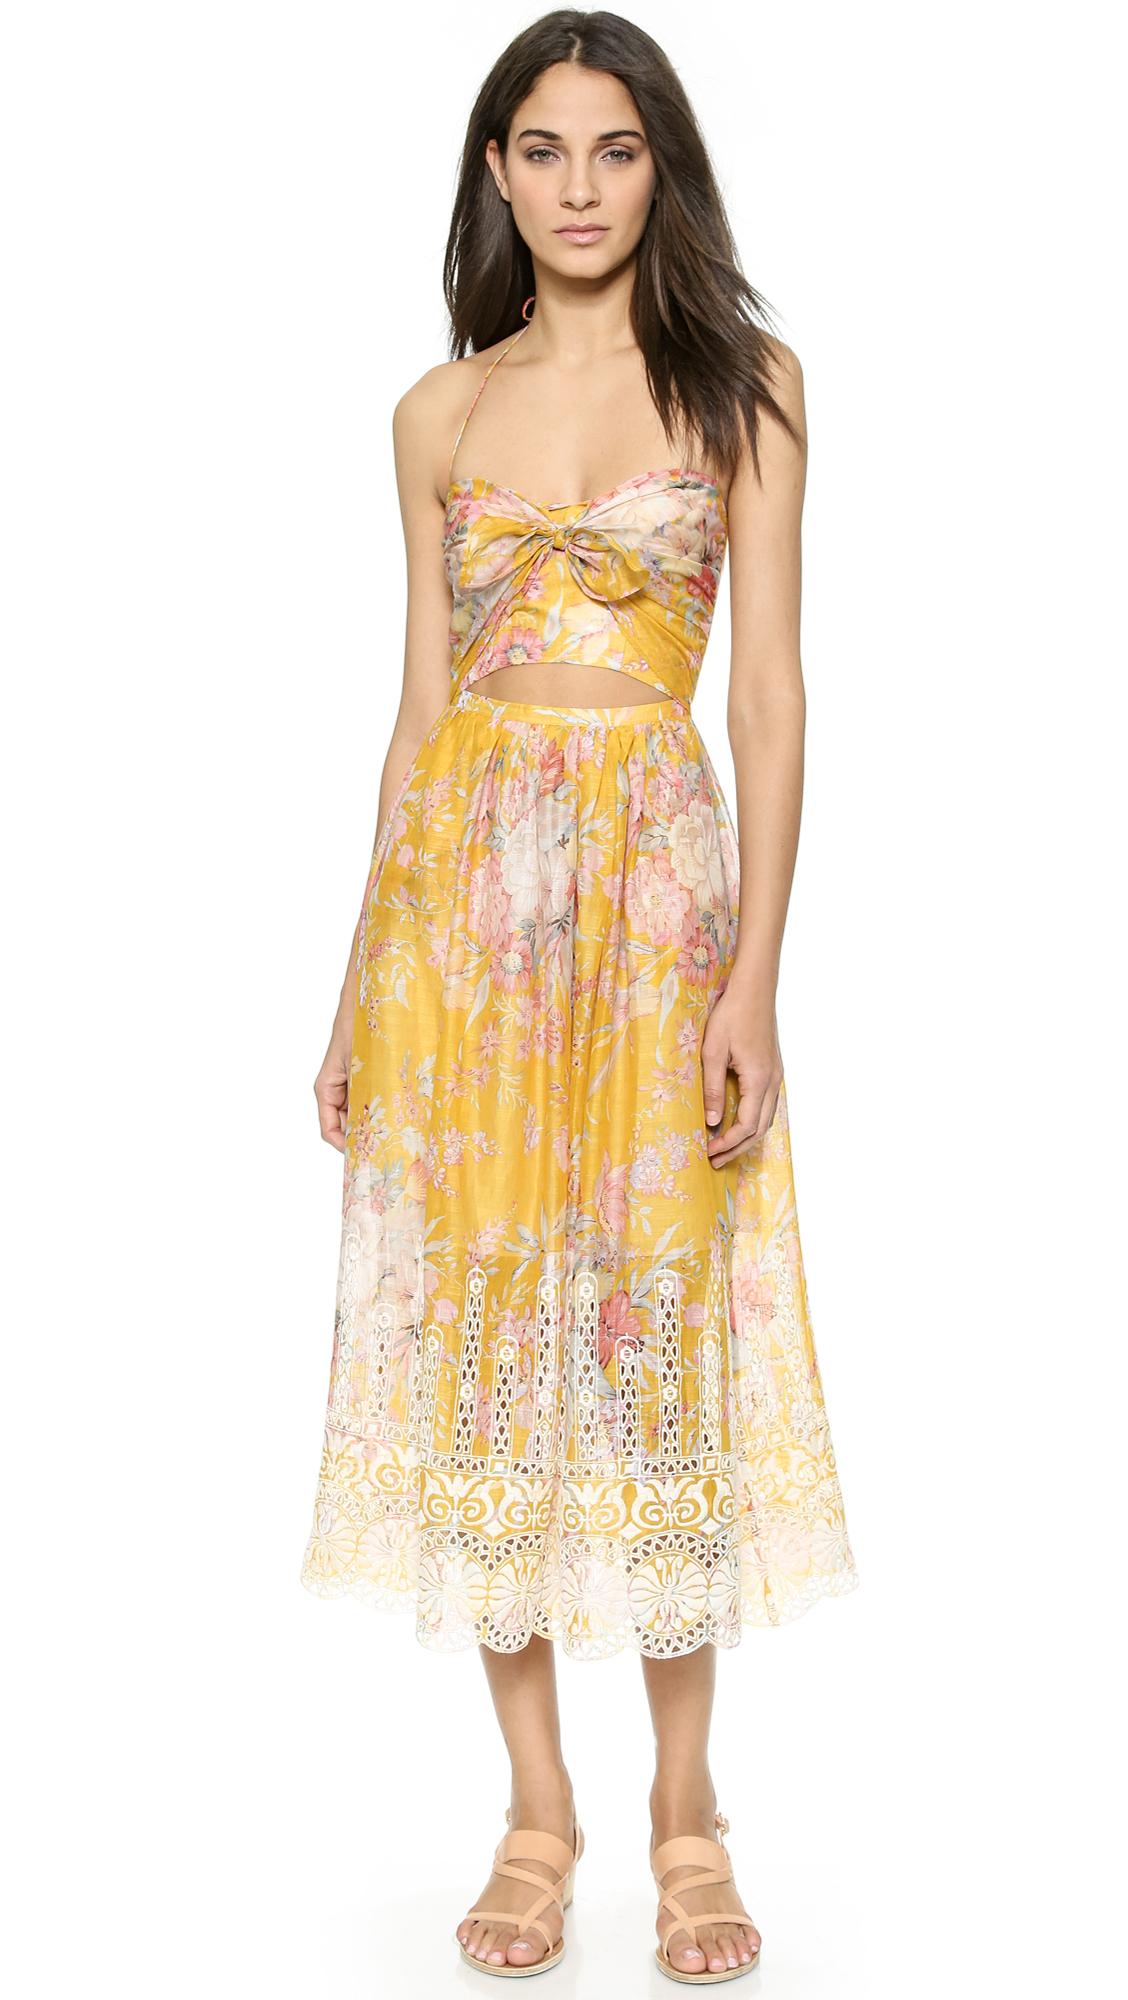 Lyst Zimmermann Confetti Scallop Tie Dress Mustard Floral